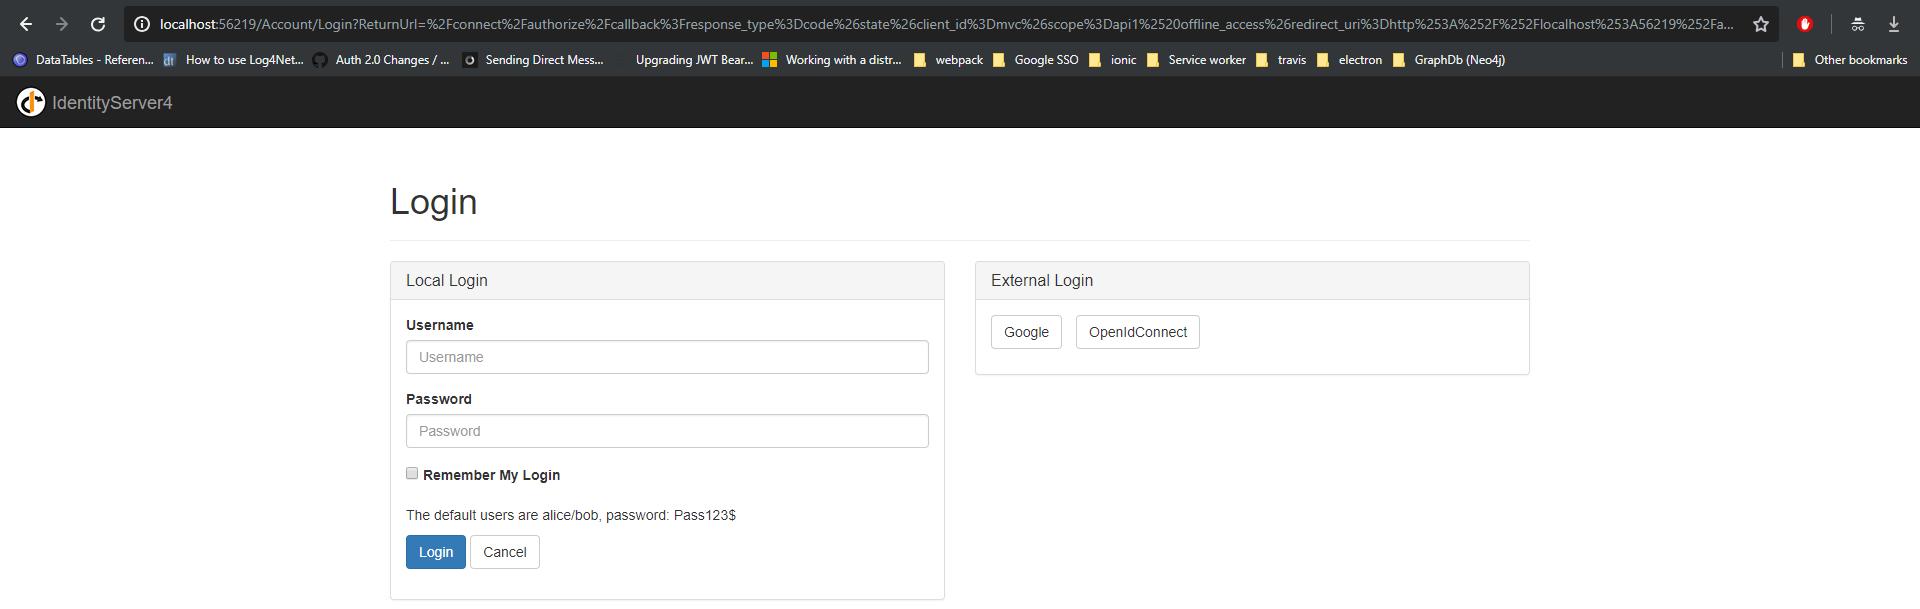 IdentityServer4 Quickstart UI AspNetIdentity not redirect